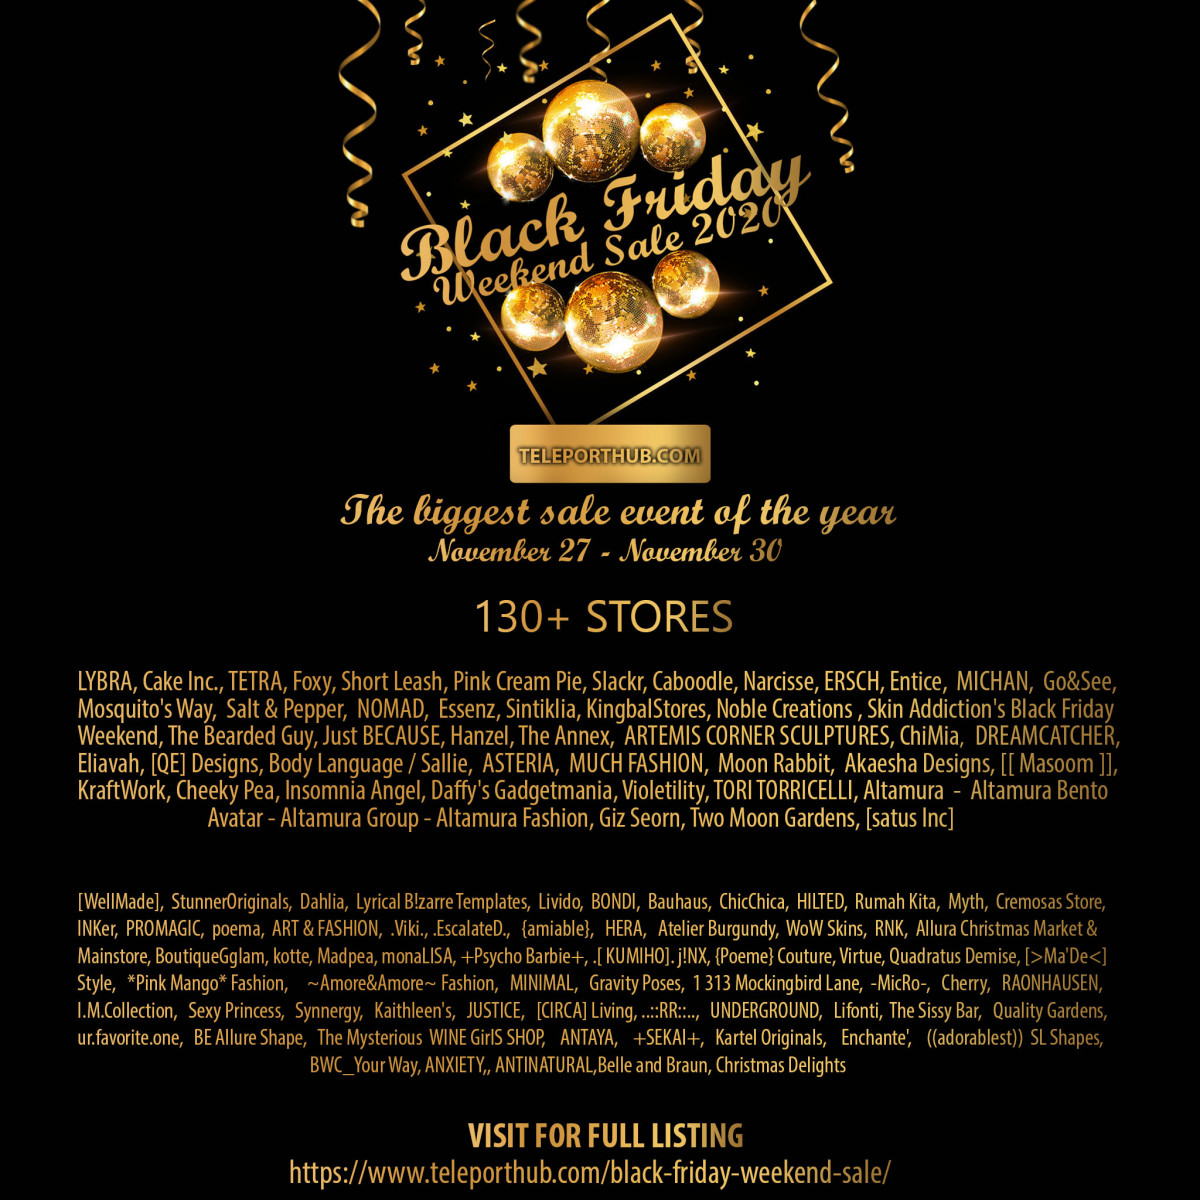 Black Friday Weekend Sale 2020 - Teleport Hub - teleporthub.com